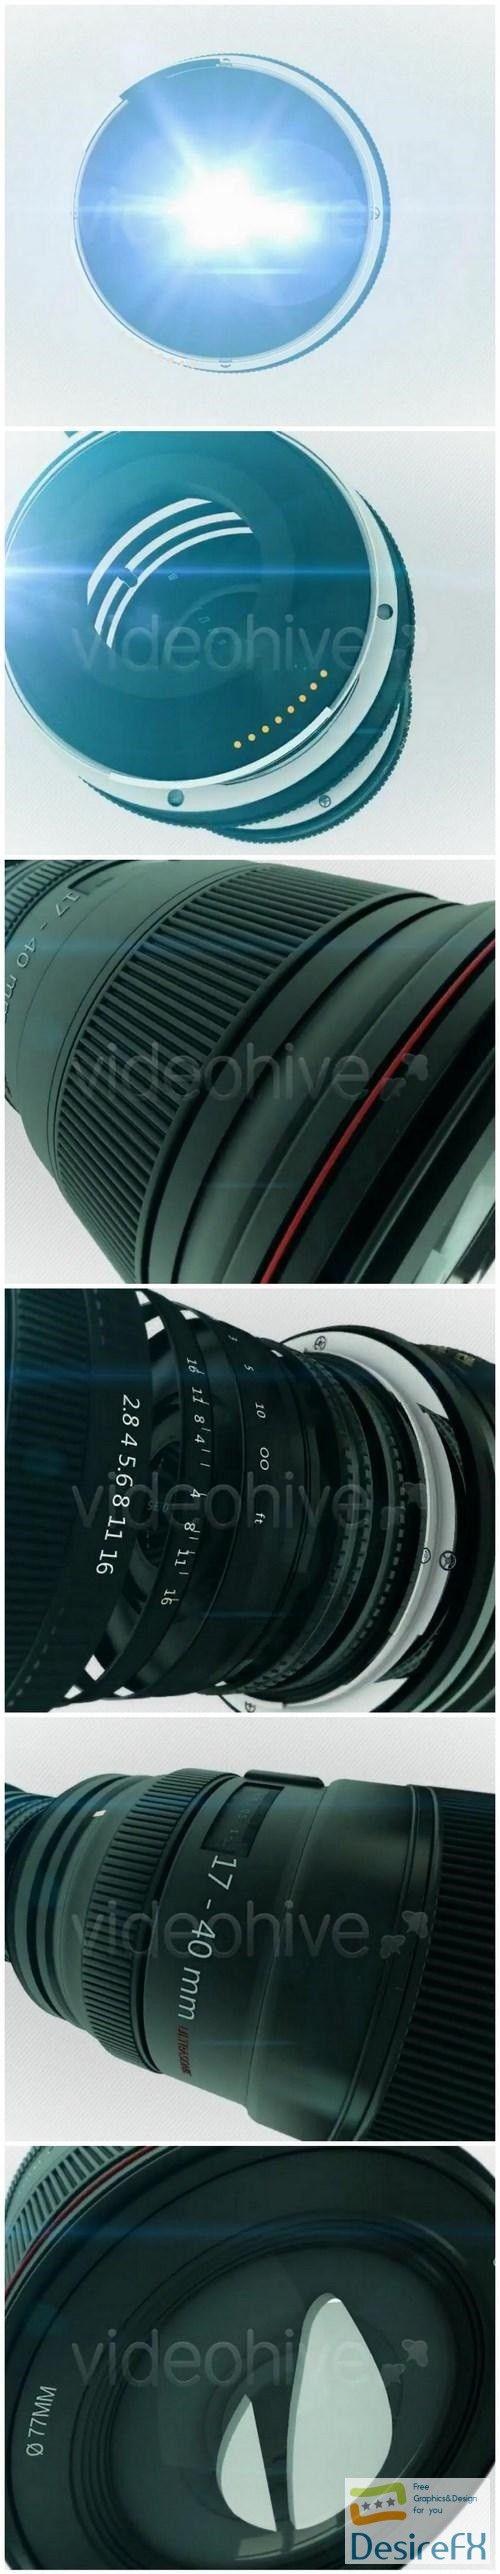 Videohive+4656920+Camera+Logo